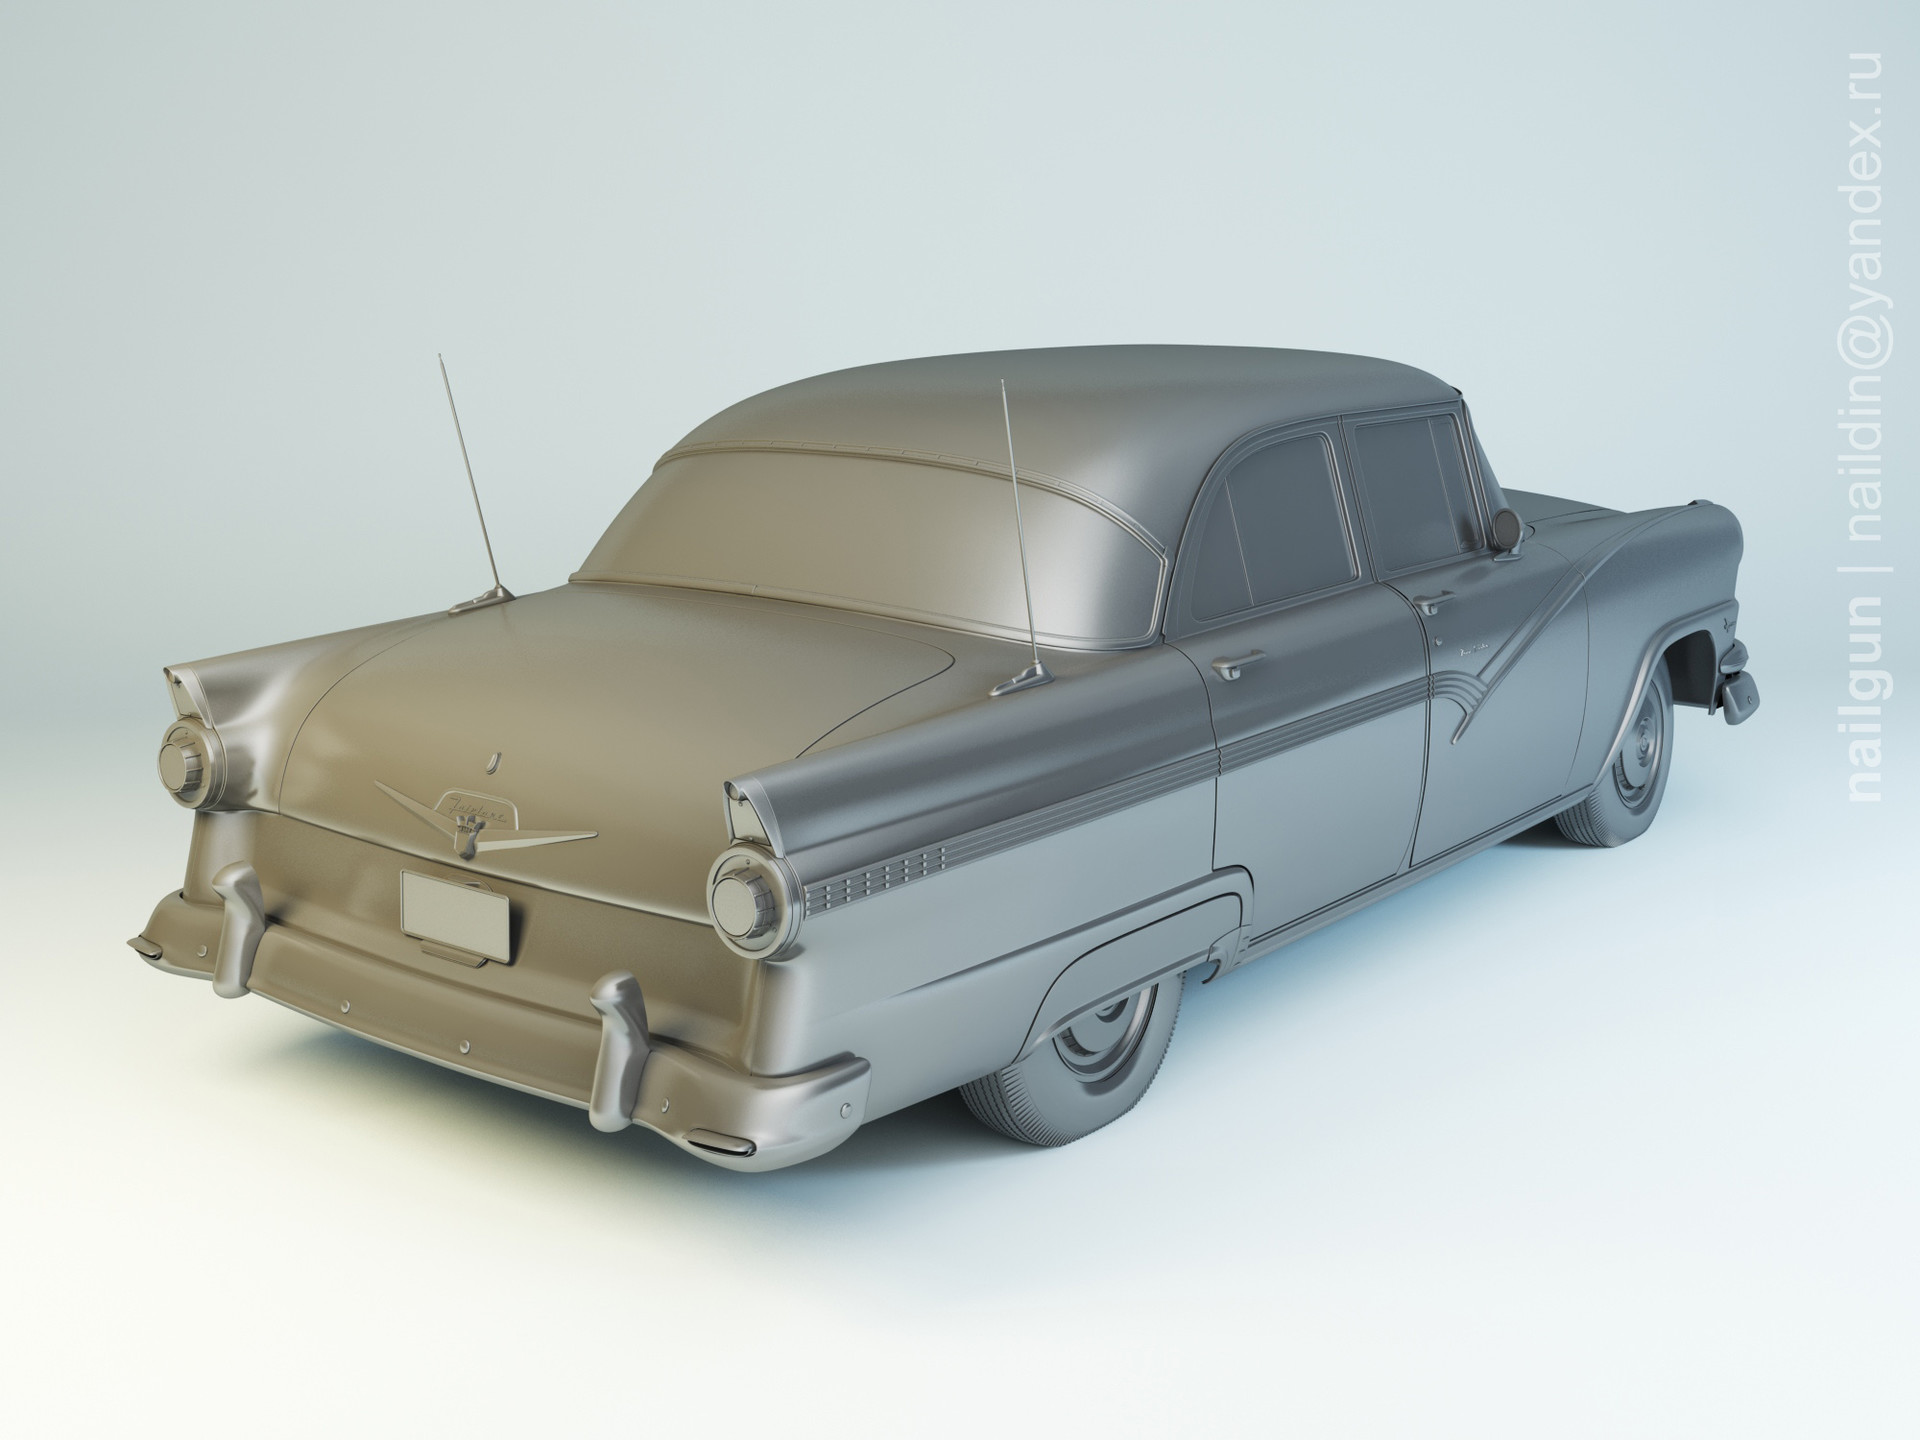 Nail khusnutdinov pwc 001 010 ford fairlane 1956 modelling 1